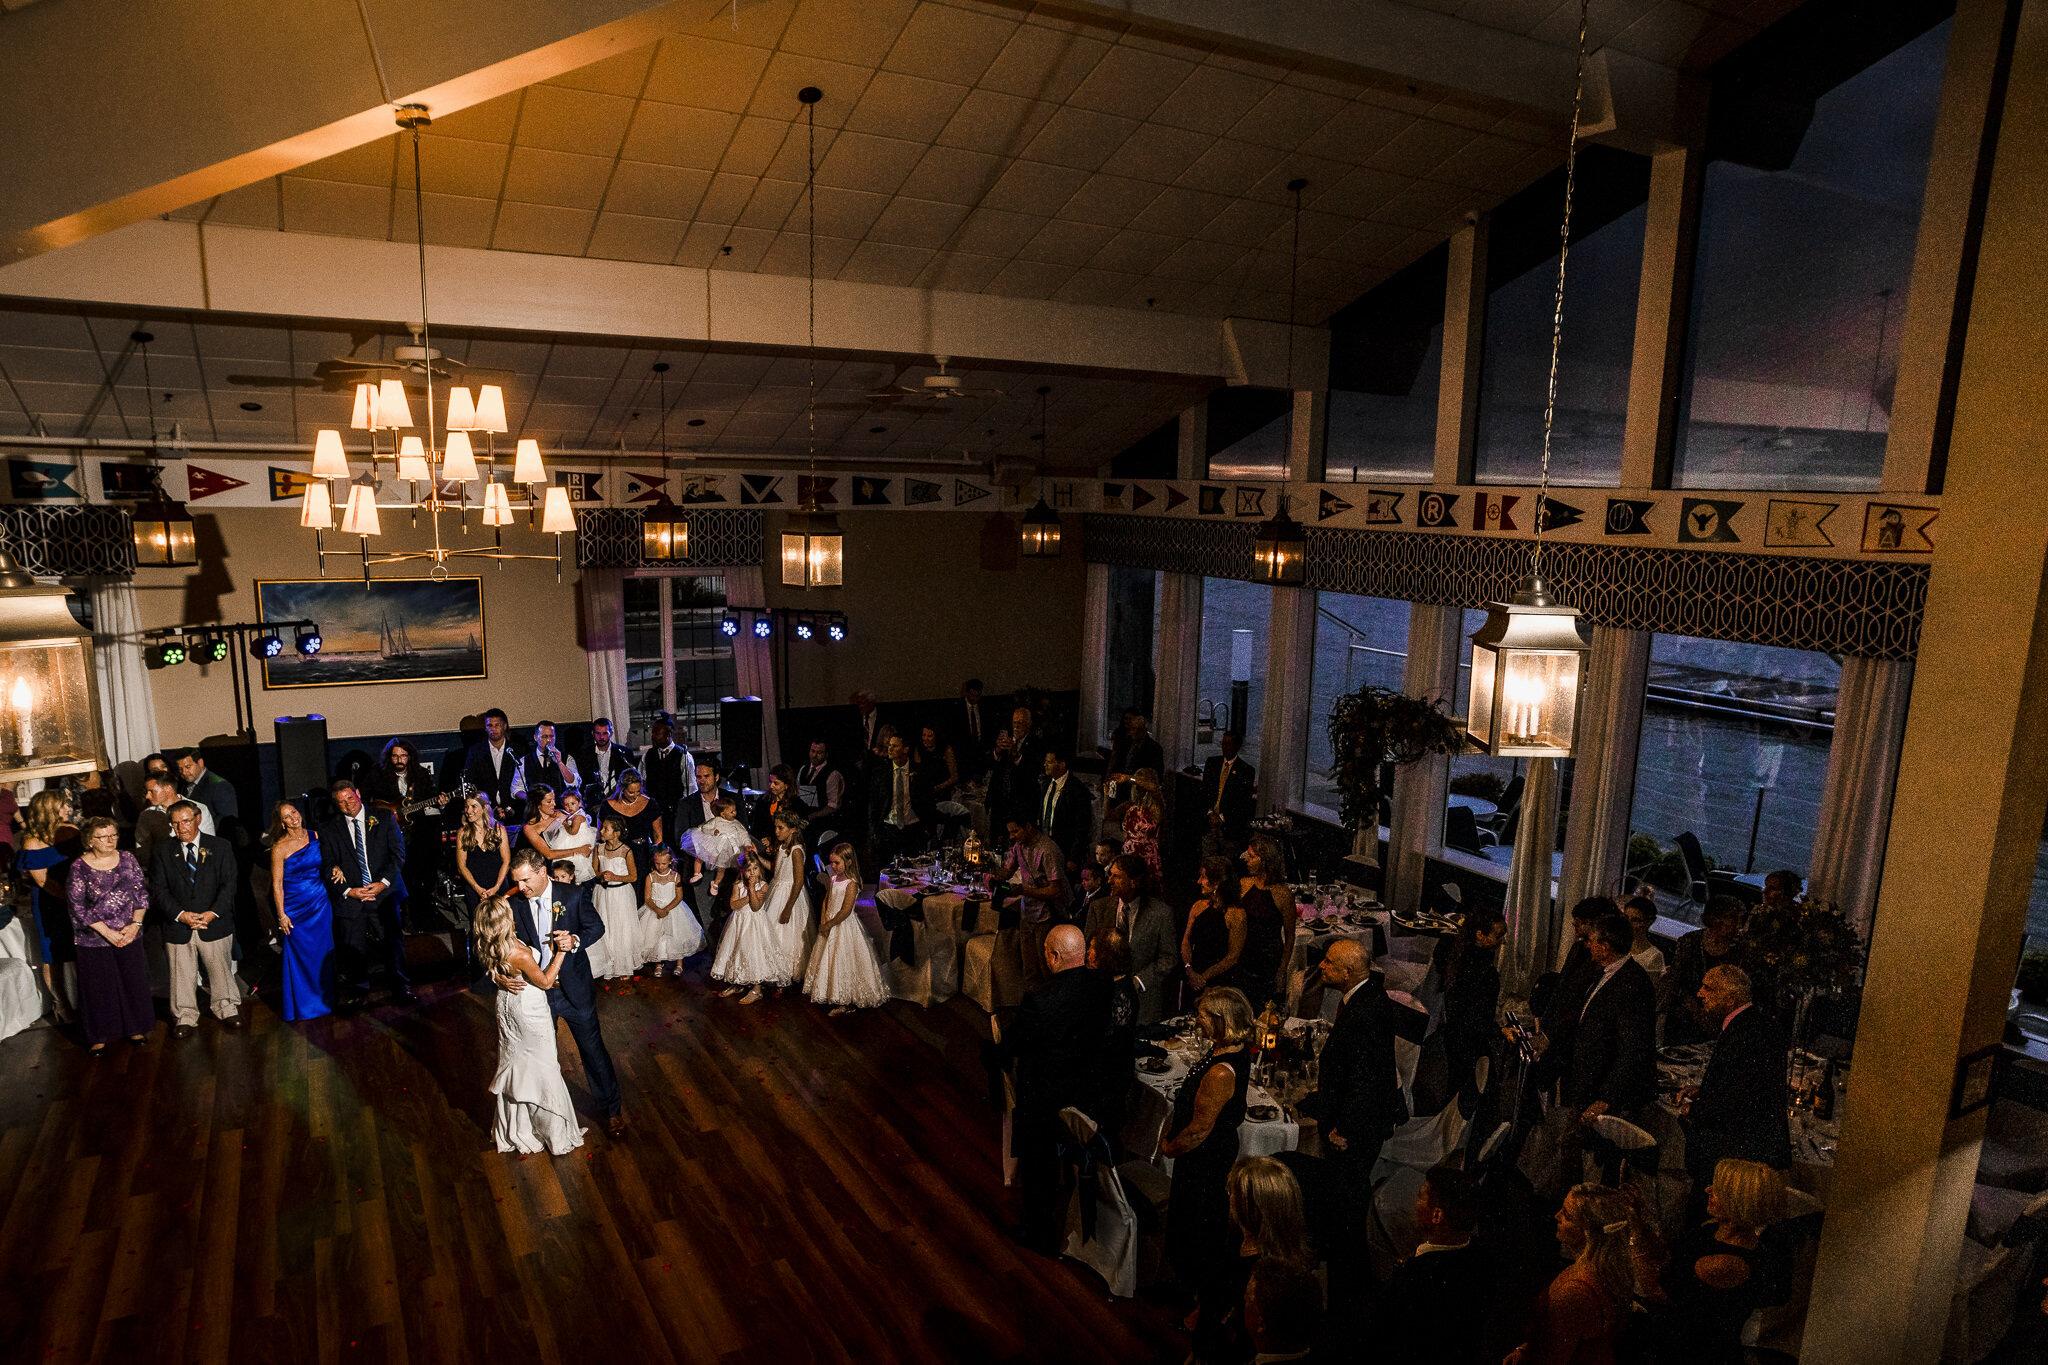 Snell-Ocean-City-Yacht-Club-New-Jersey-Wedding-Photographer-26.JPG